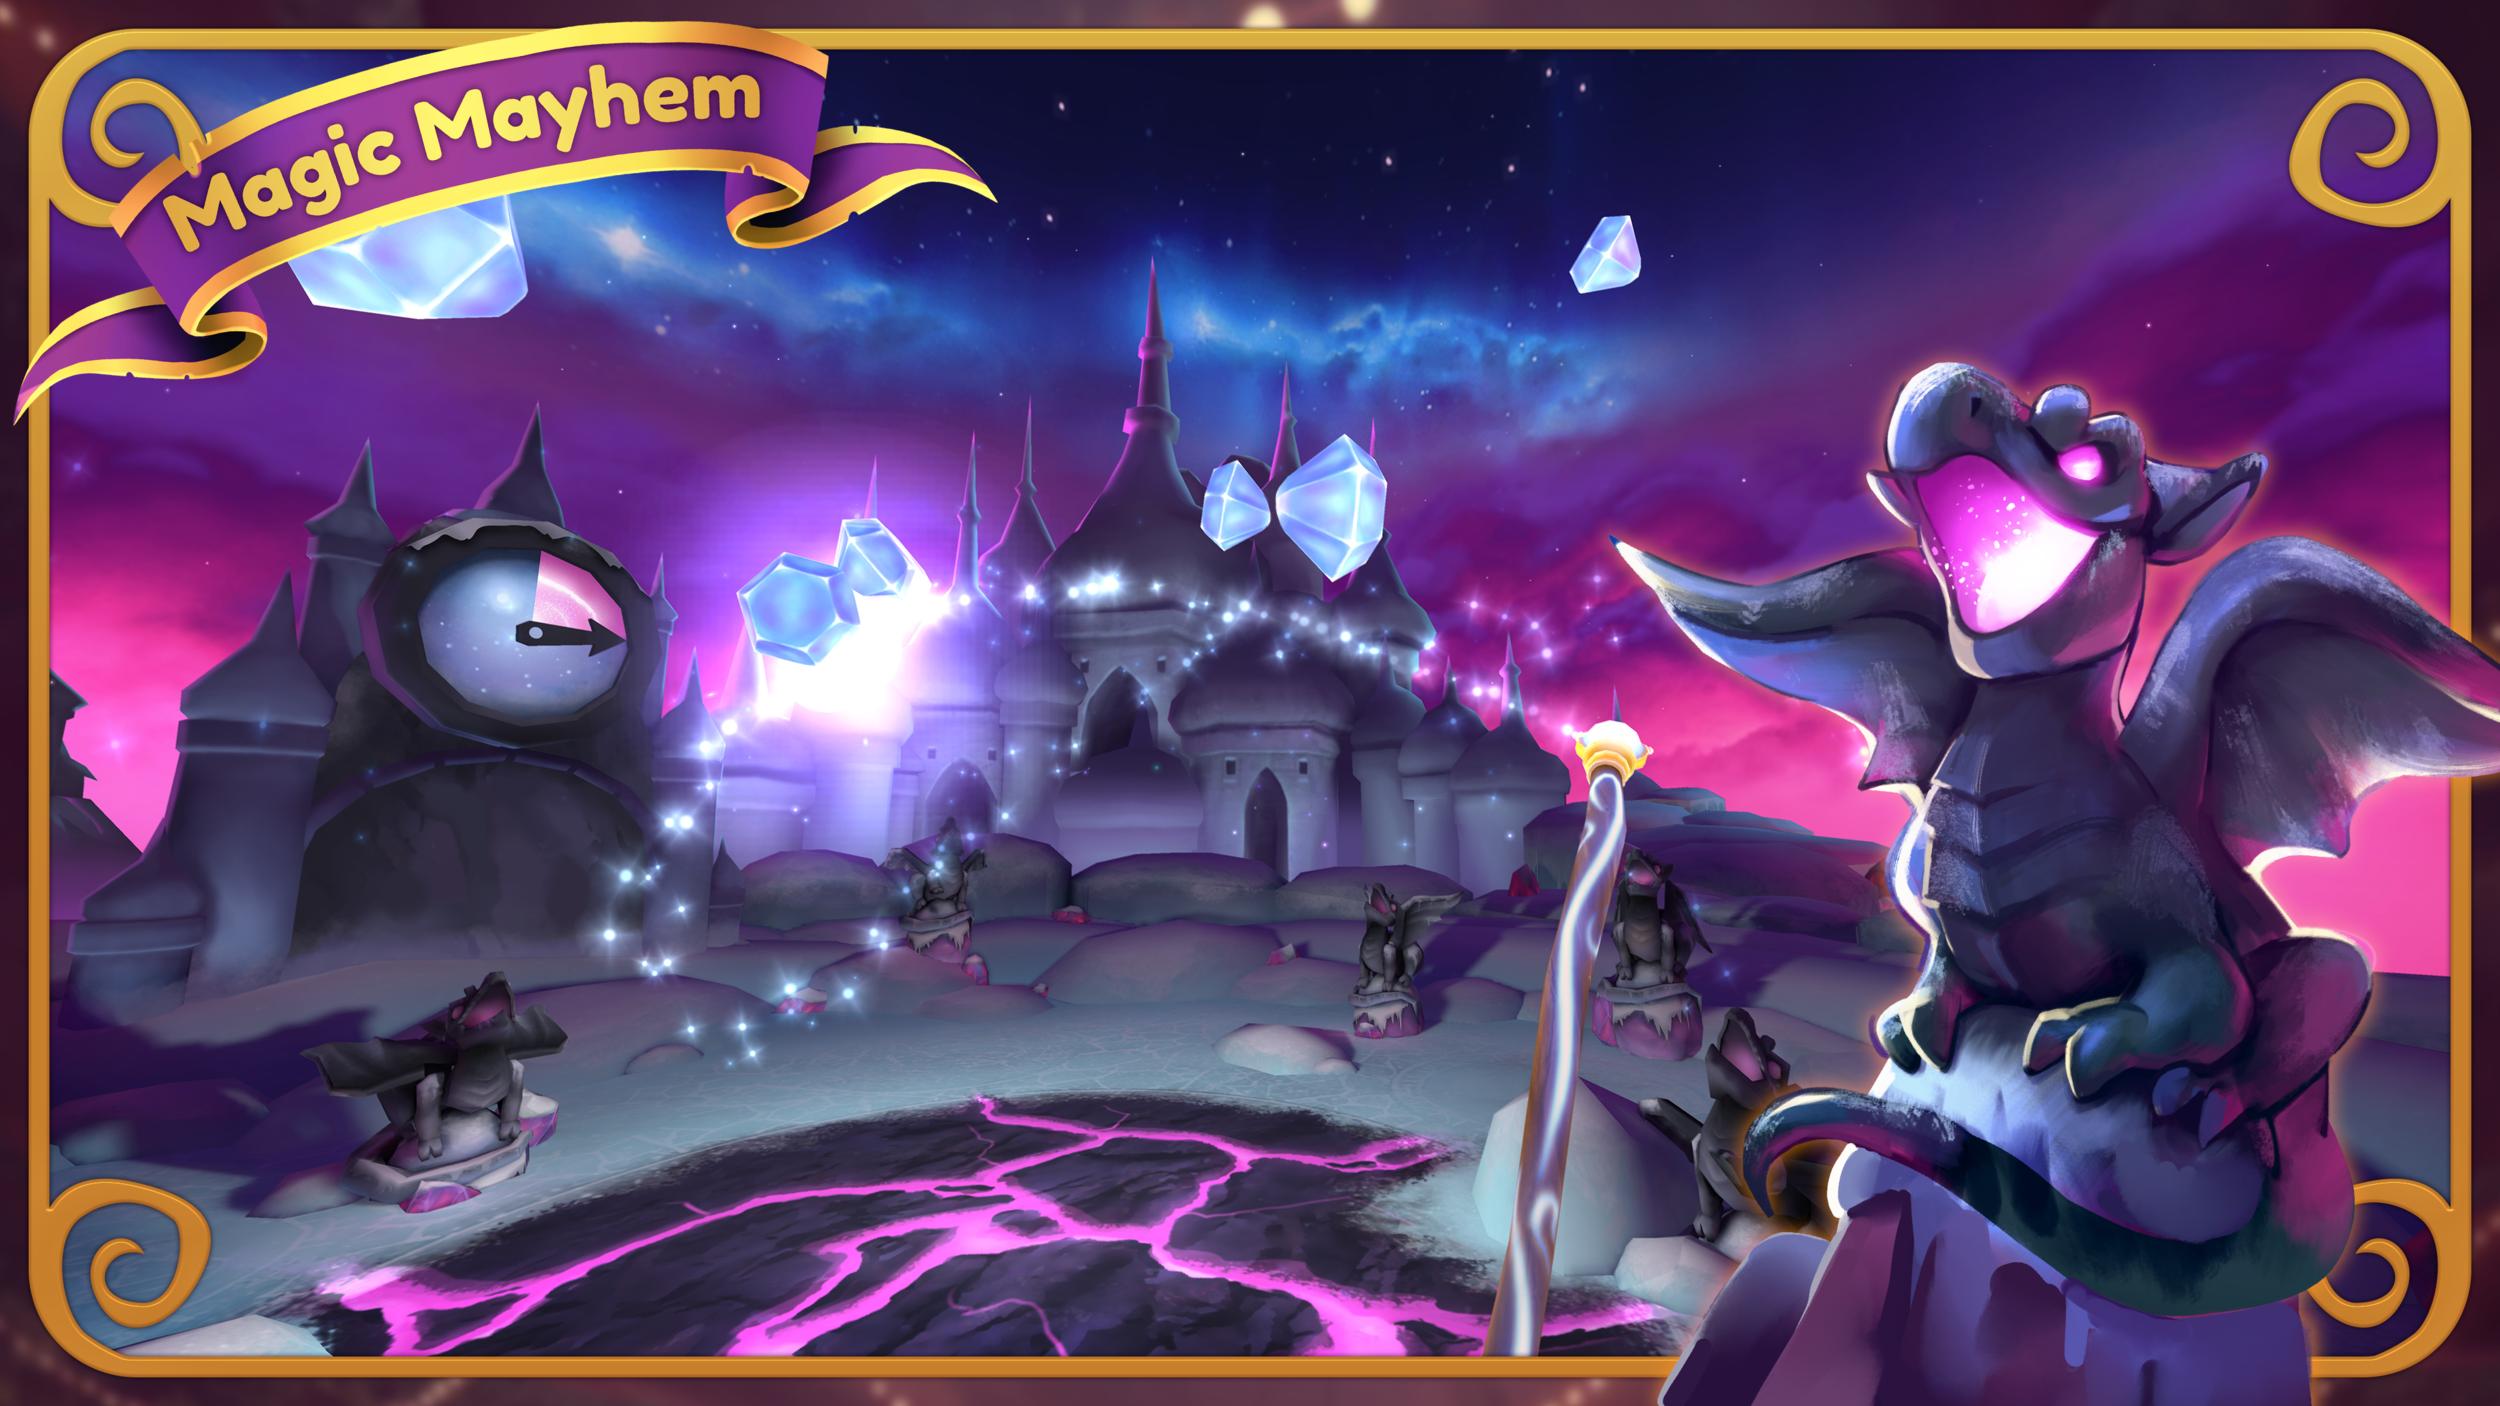 MagicMayhemScreenshot1.png